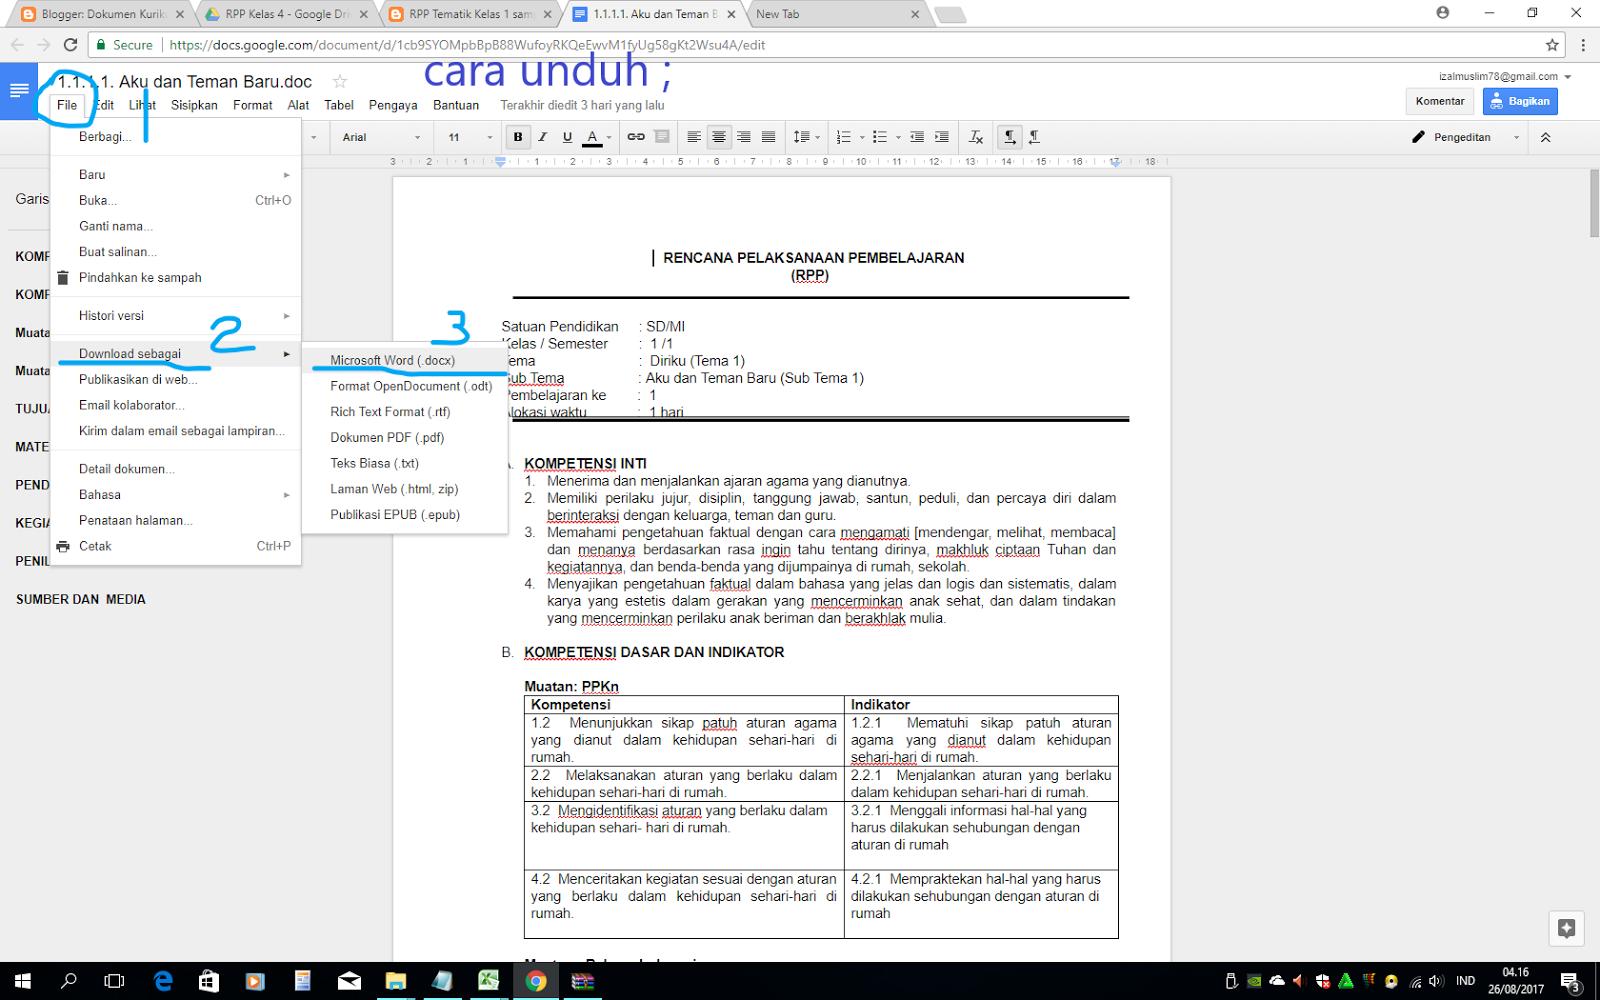 Rpp Tematik Kelas 1 Sampai Kelas 6 Sd Mi Kurikulum 2013 Revisi 2017 Dokumen Kurikulum 2013 Revisi Terbaru